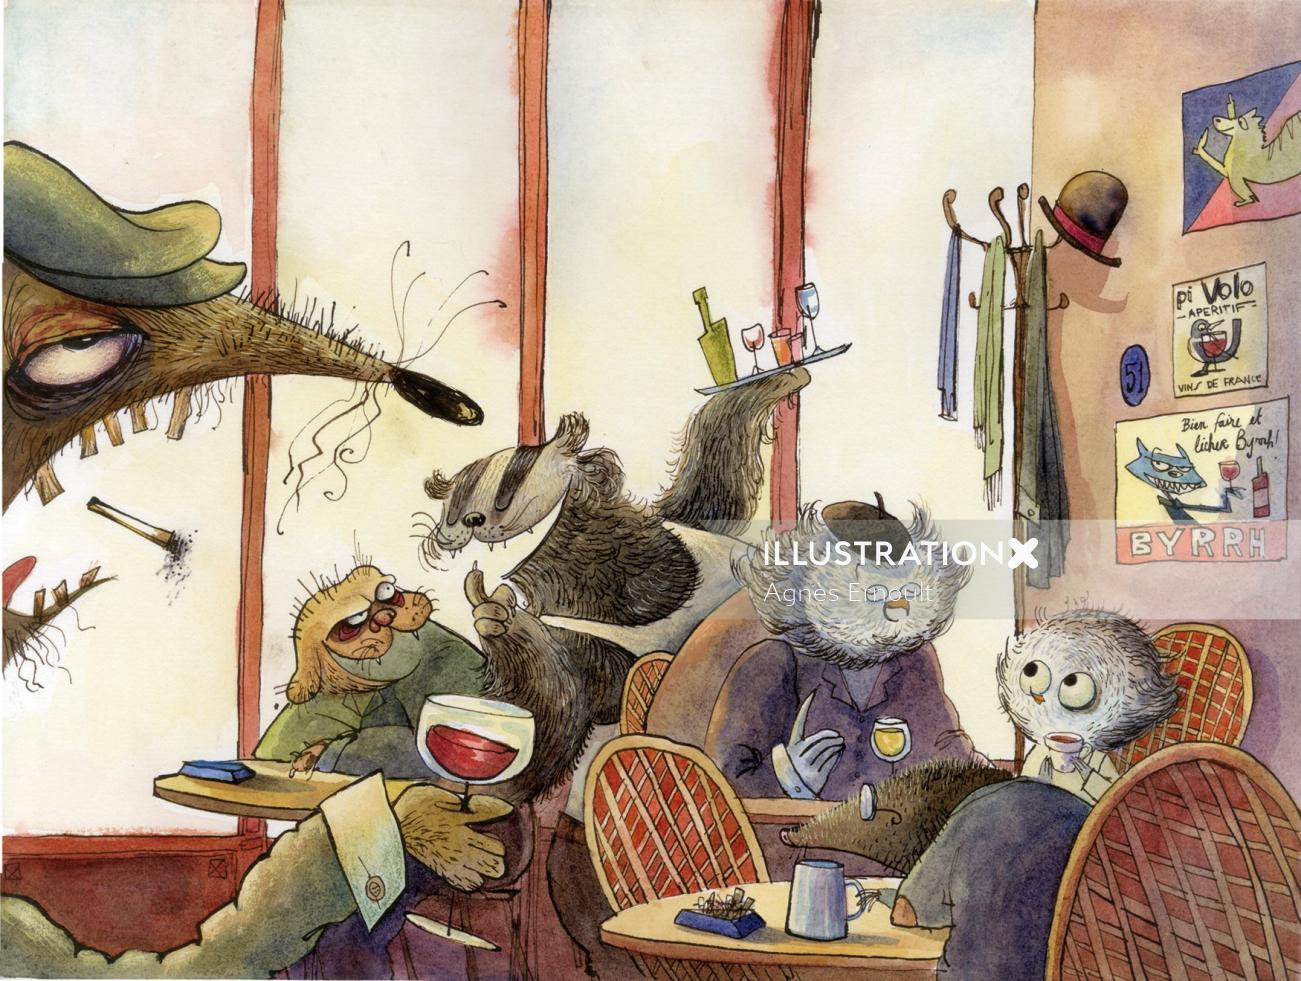 Illustration of animal family